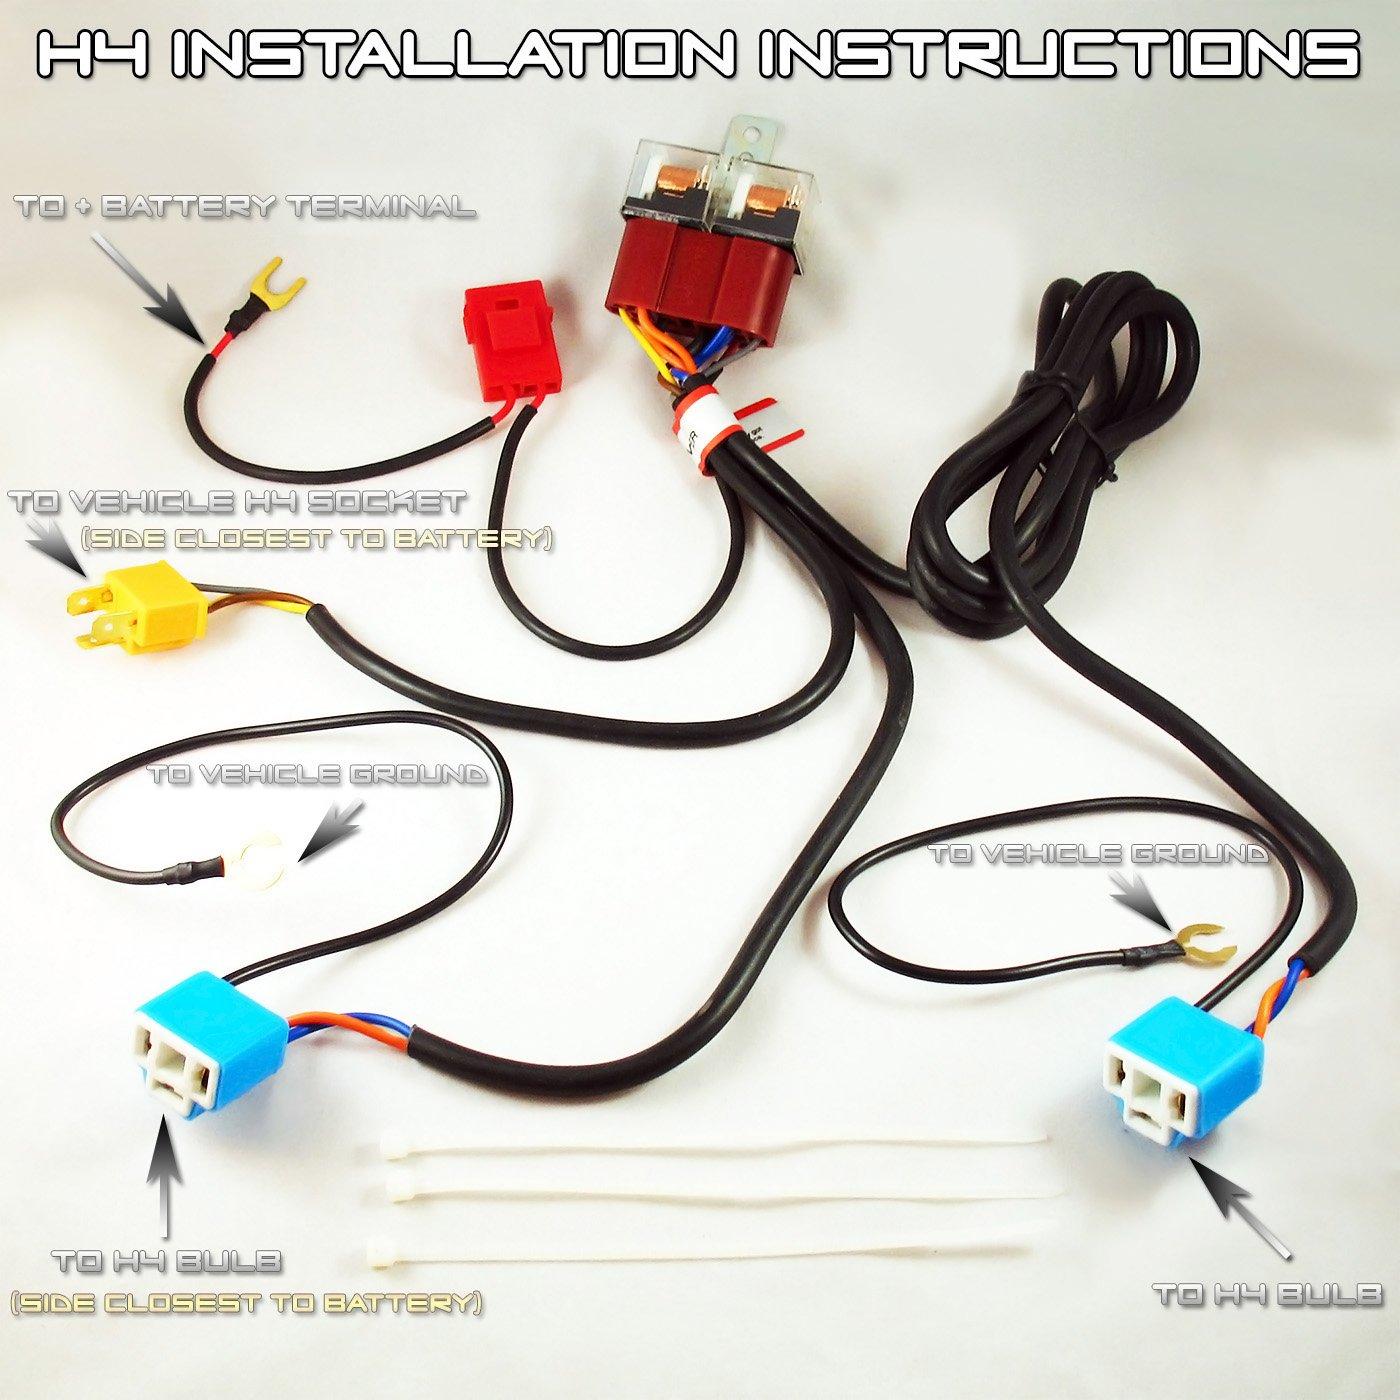 Autotechsalon Premium Slimline H4 9003 Hb2 100w Pnp Wiring Ceramic Relay Harness Bulb Headlight Foglight Booster 12v Automotive